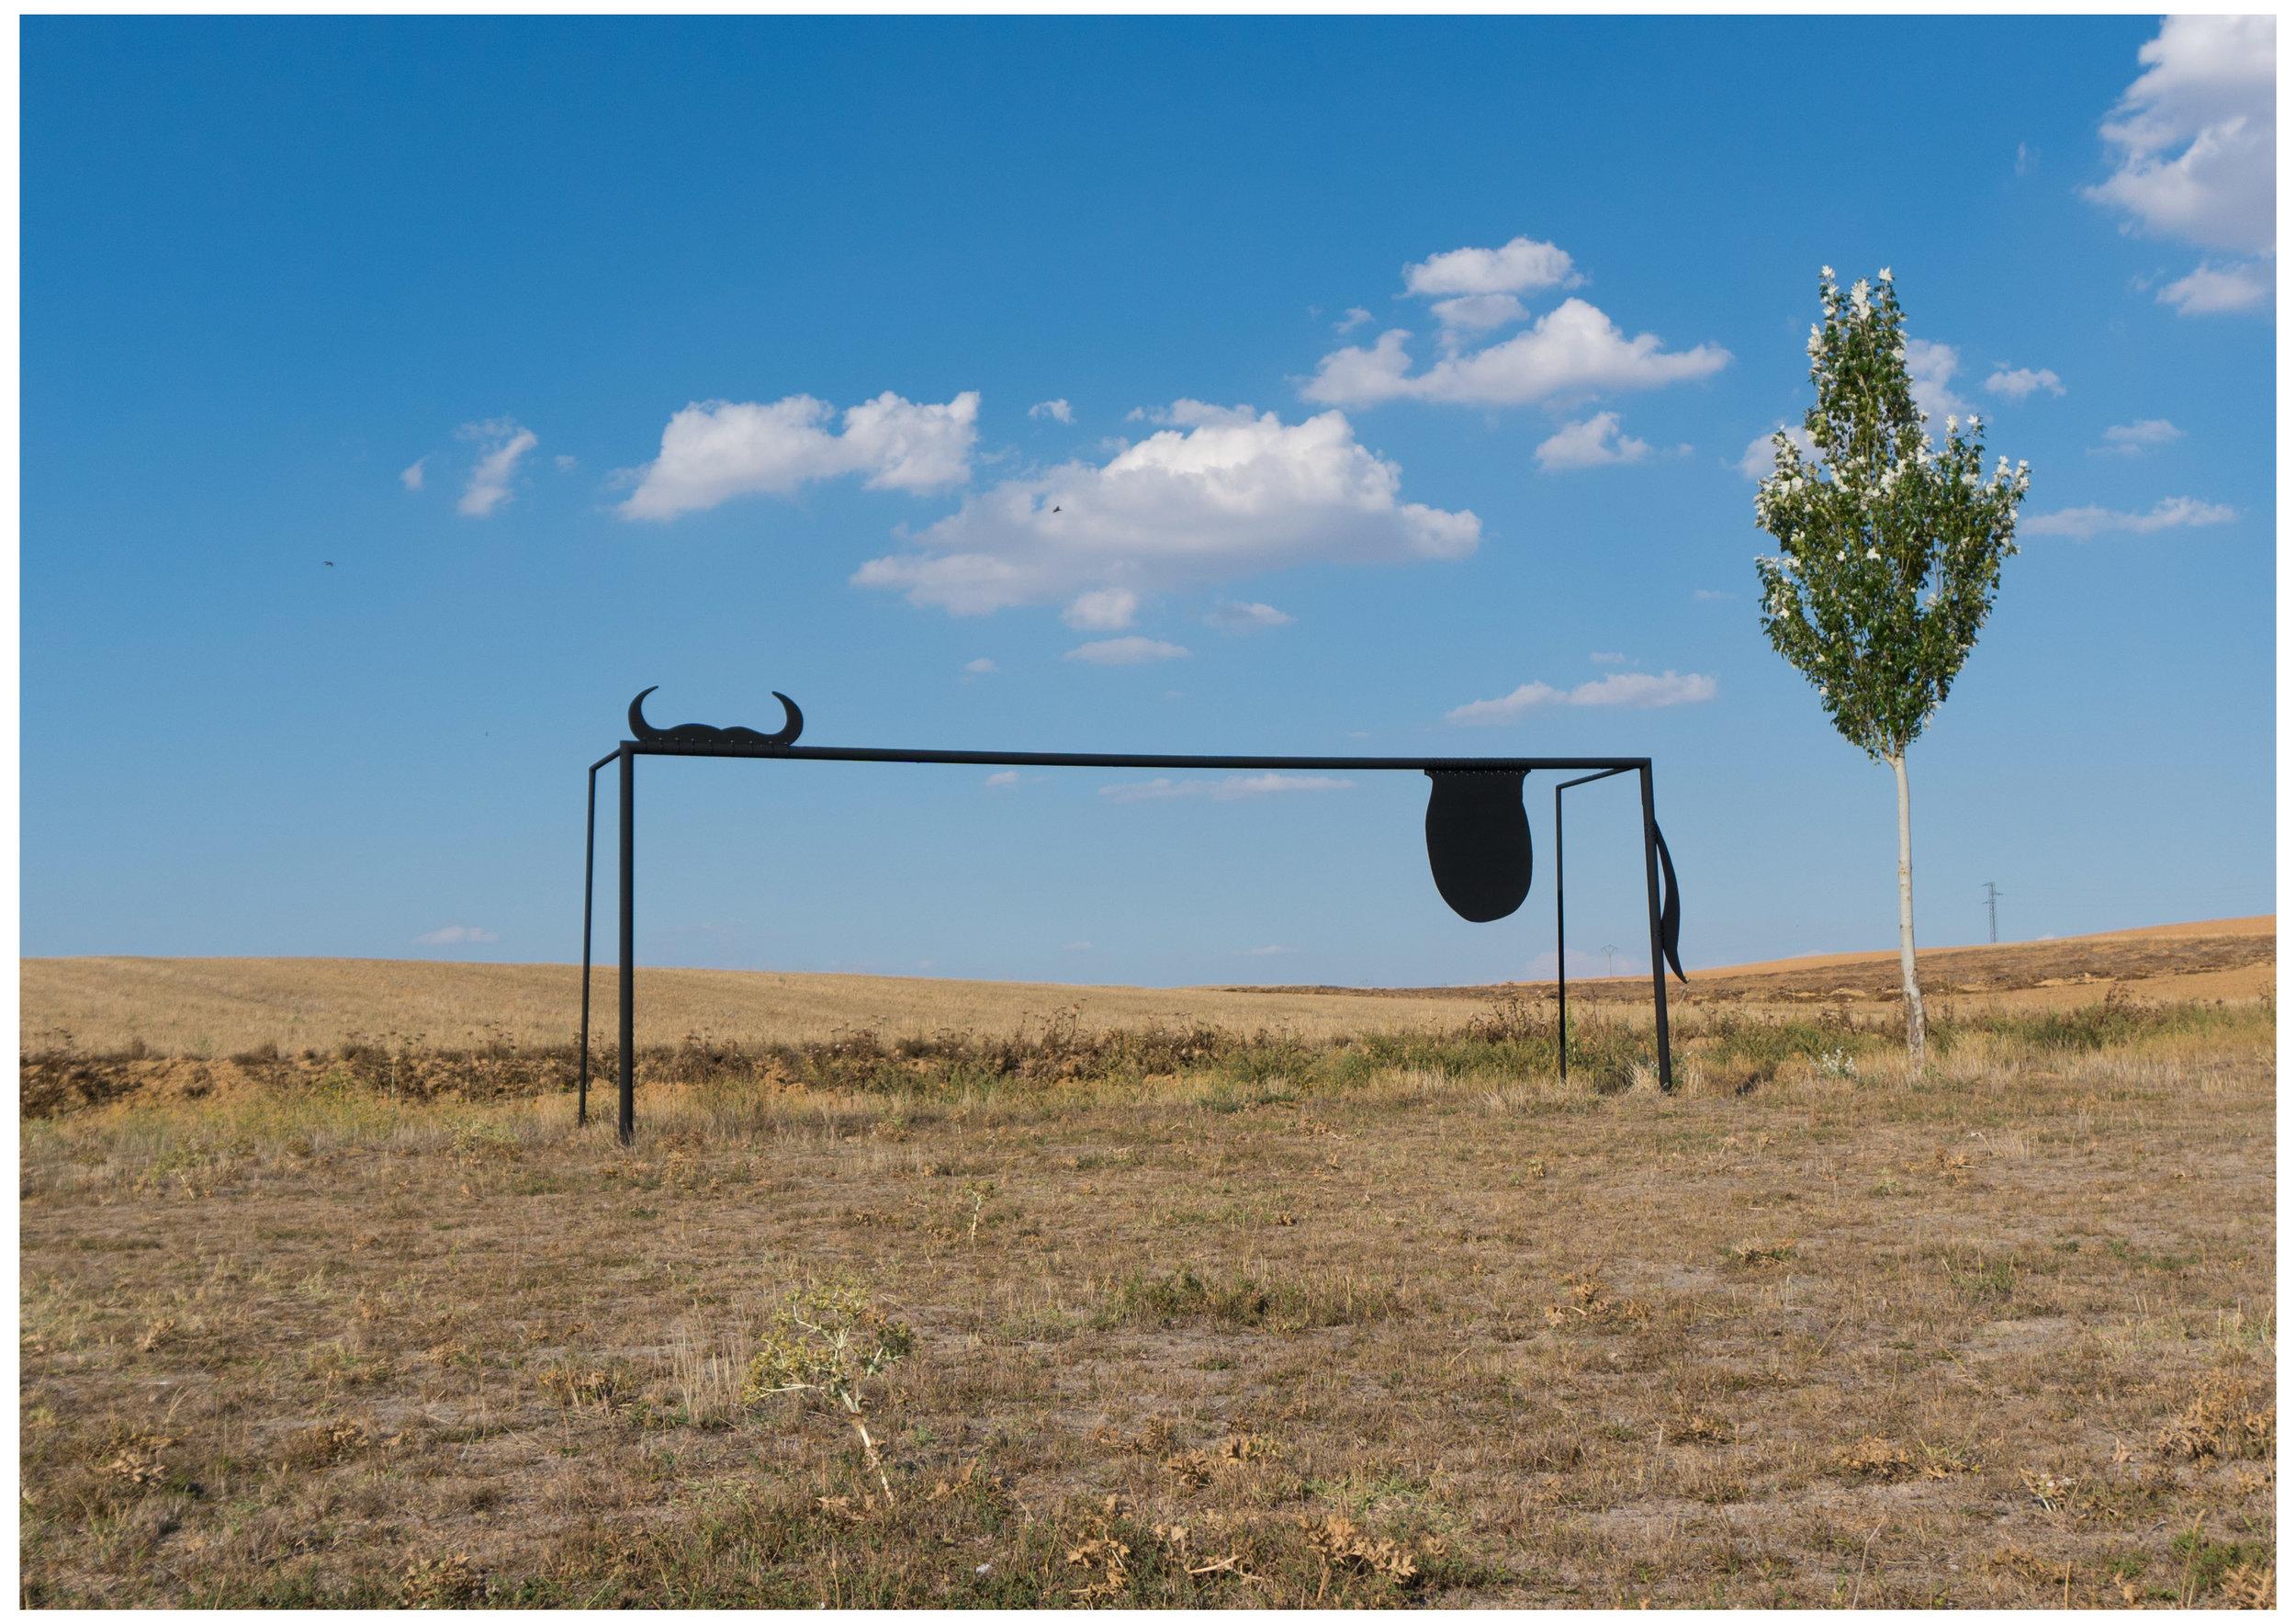 About football, goals, bulls and balls I